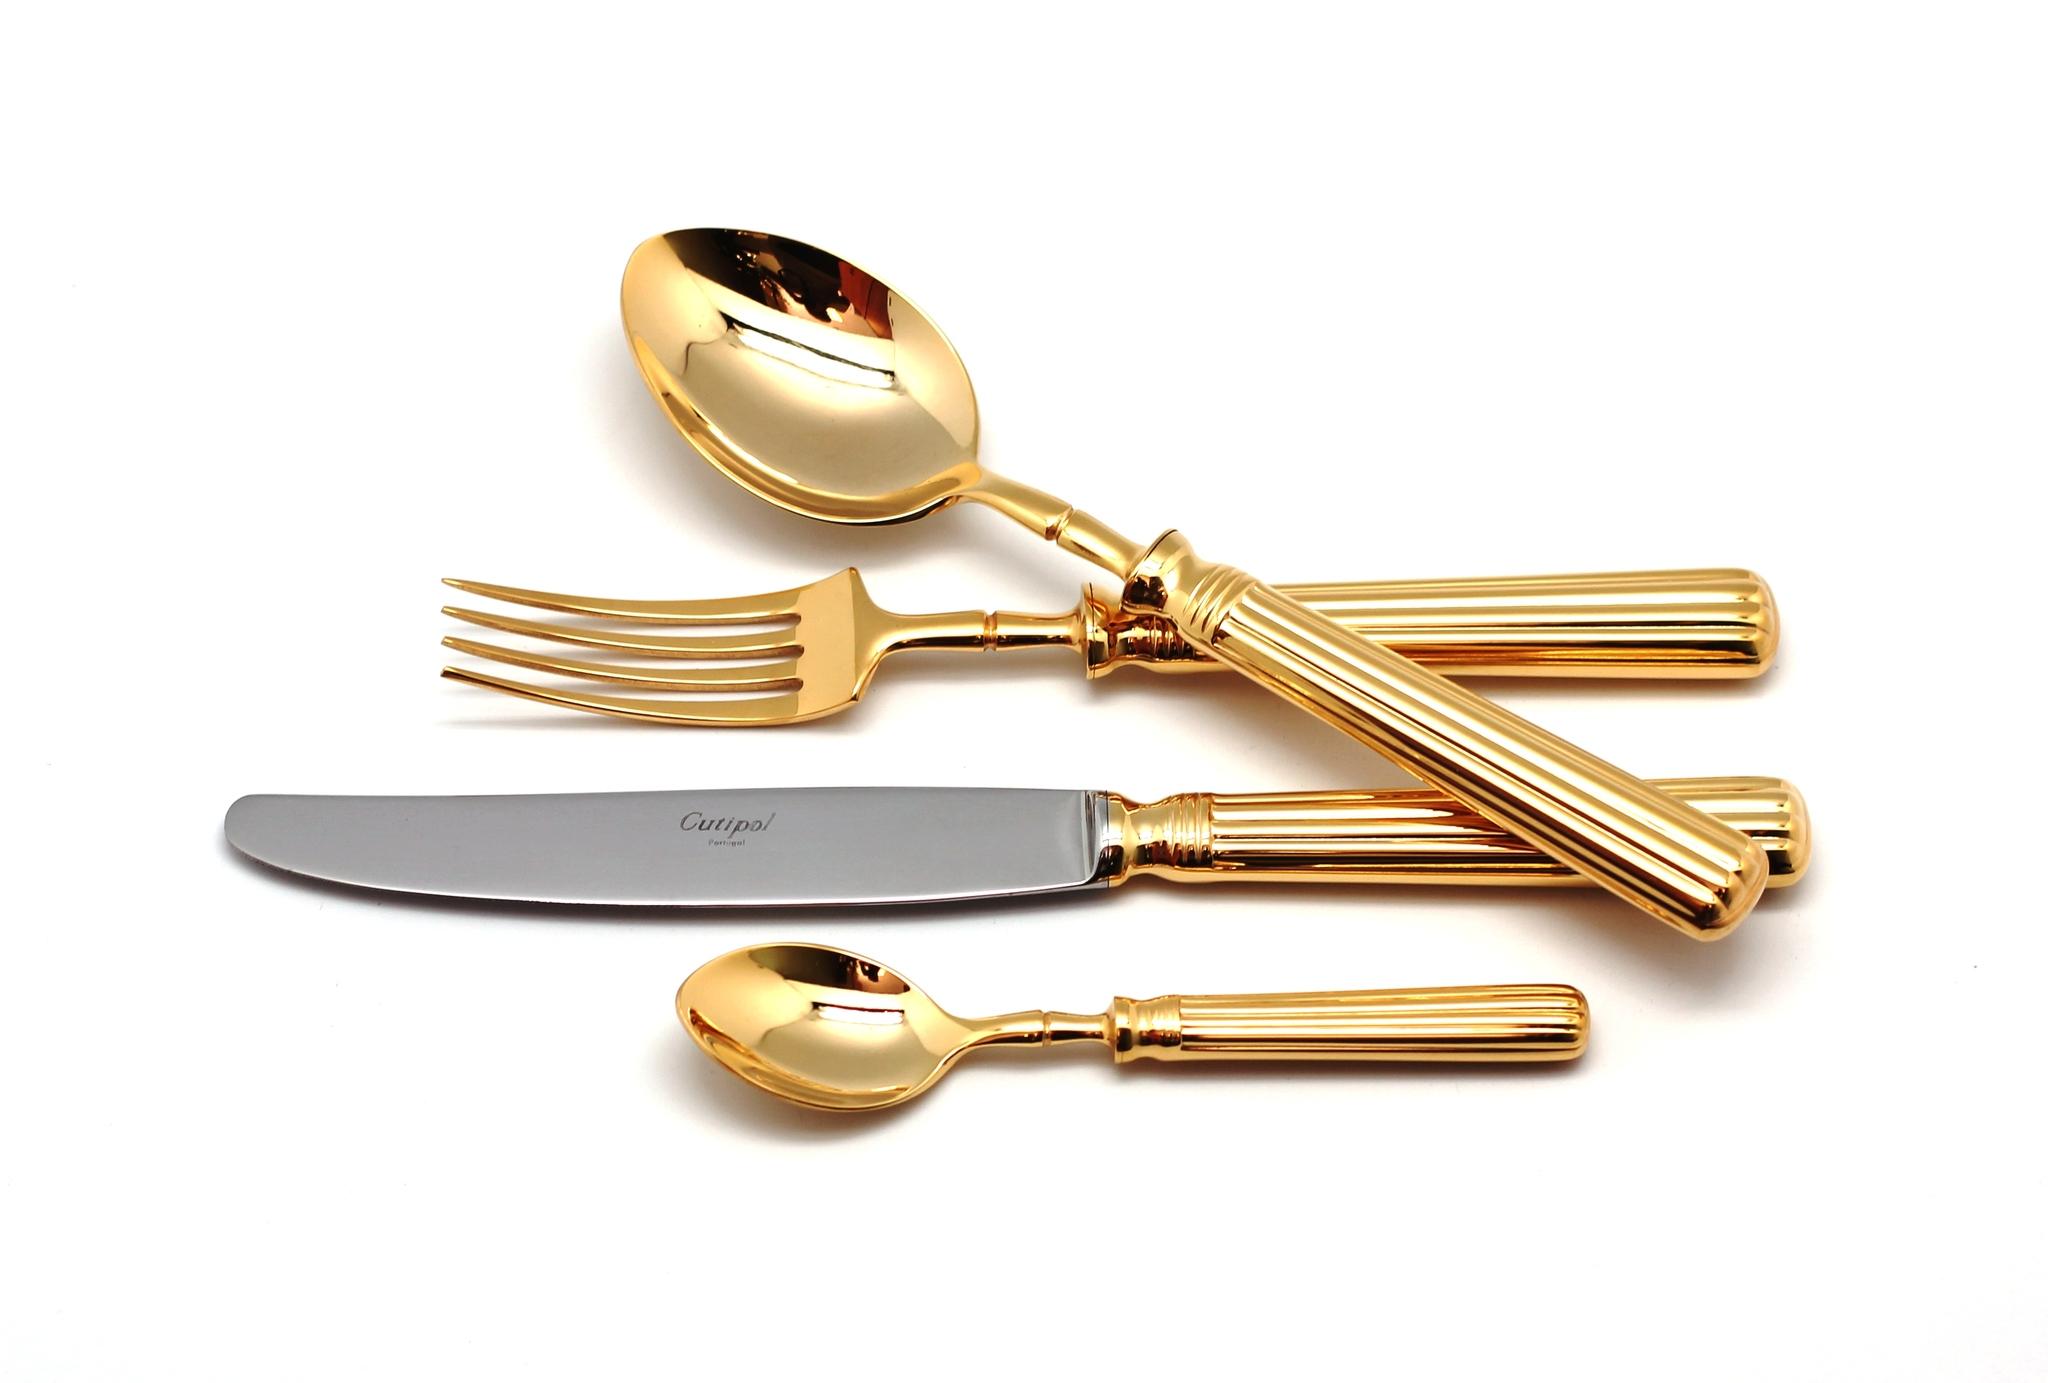 Набор 72 пр LINE GOLD, артикул 9171-72, производитель - Cutipol